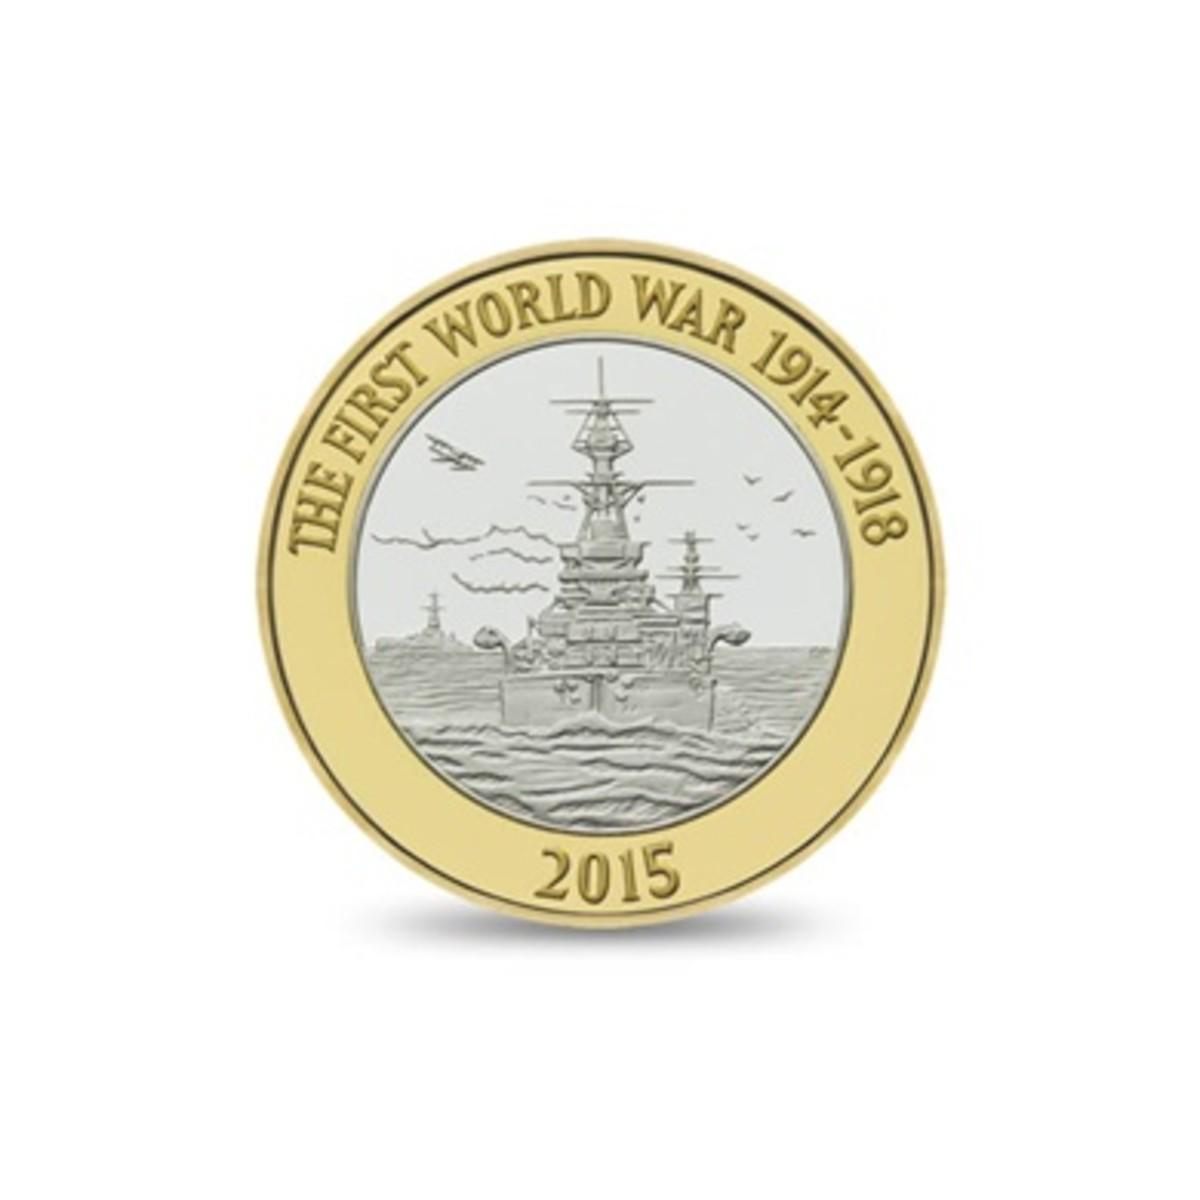 The Royal Navy 2015 £2 Coin